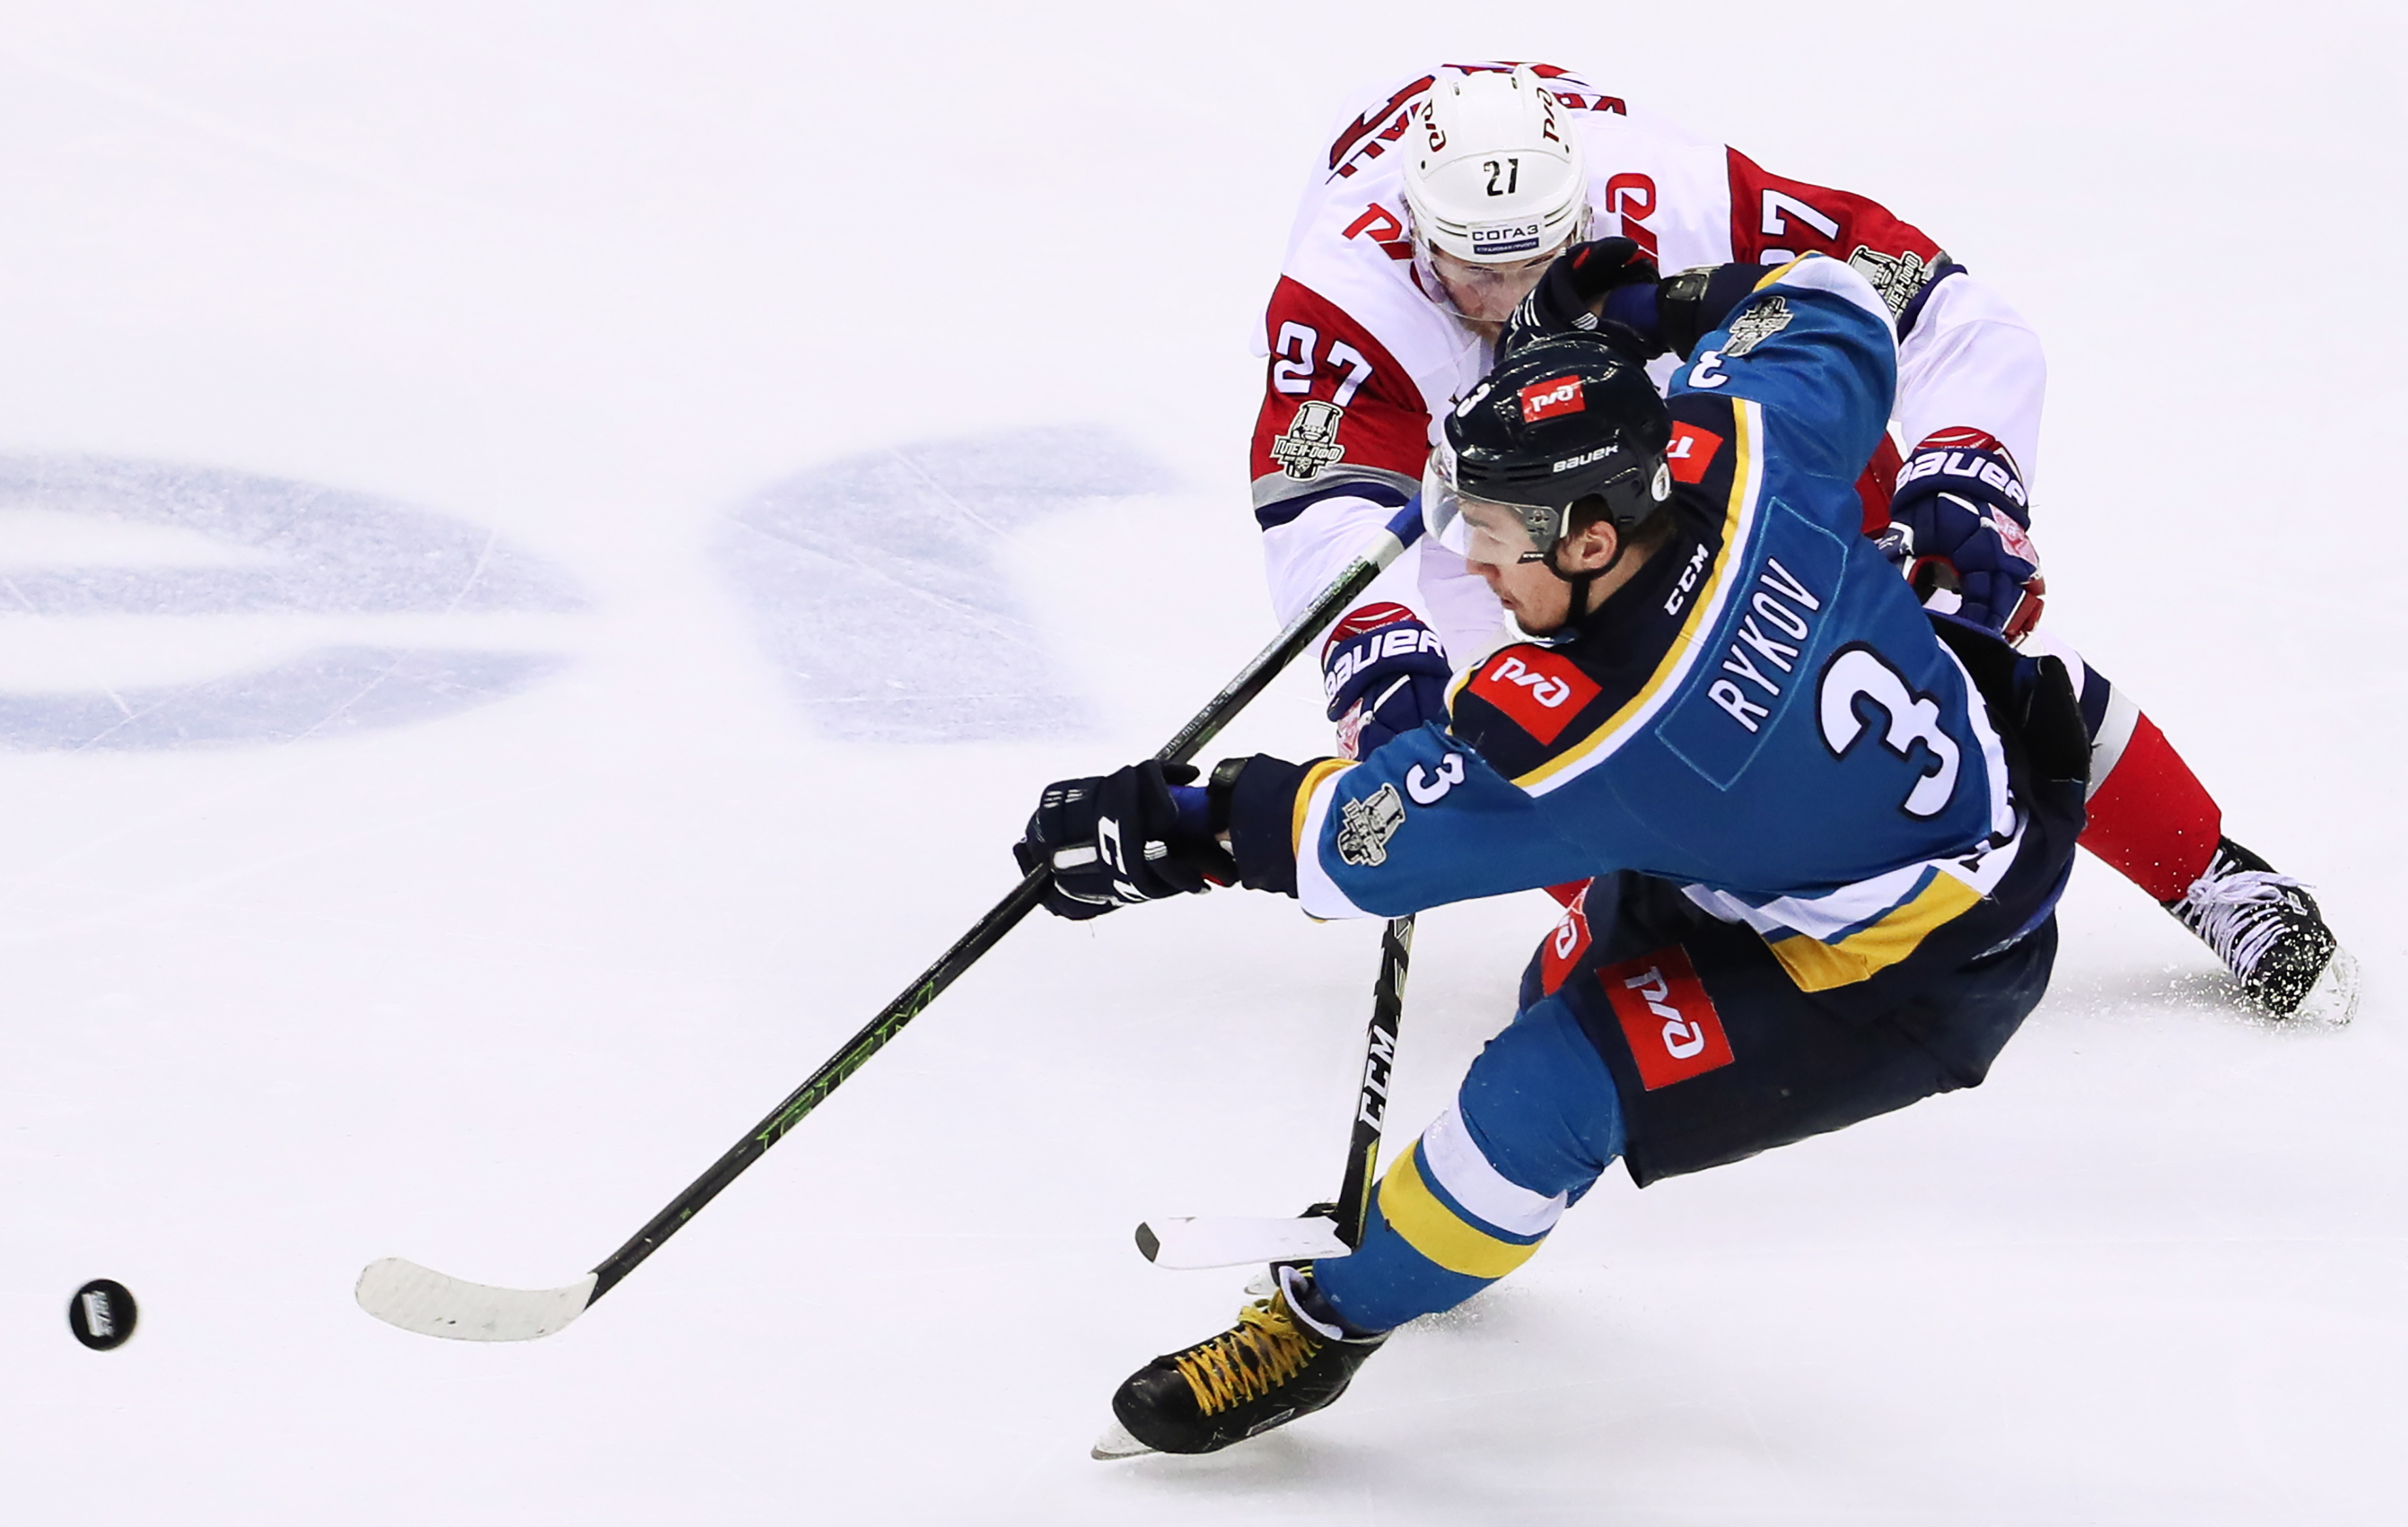 2018/2019 KHL Western Conference Quarterfinal, Leg 3: HC Sochi 3 - 2 Lokomotiv Yaroslavl